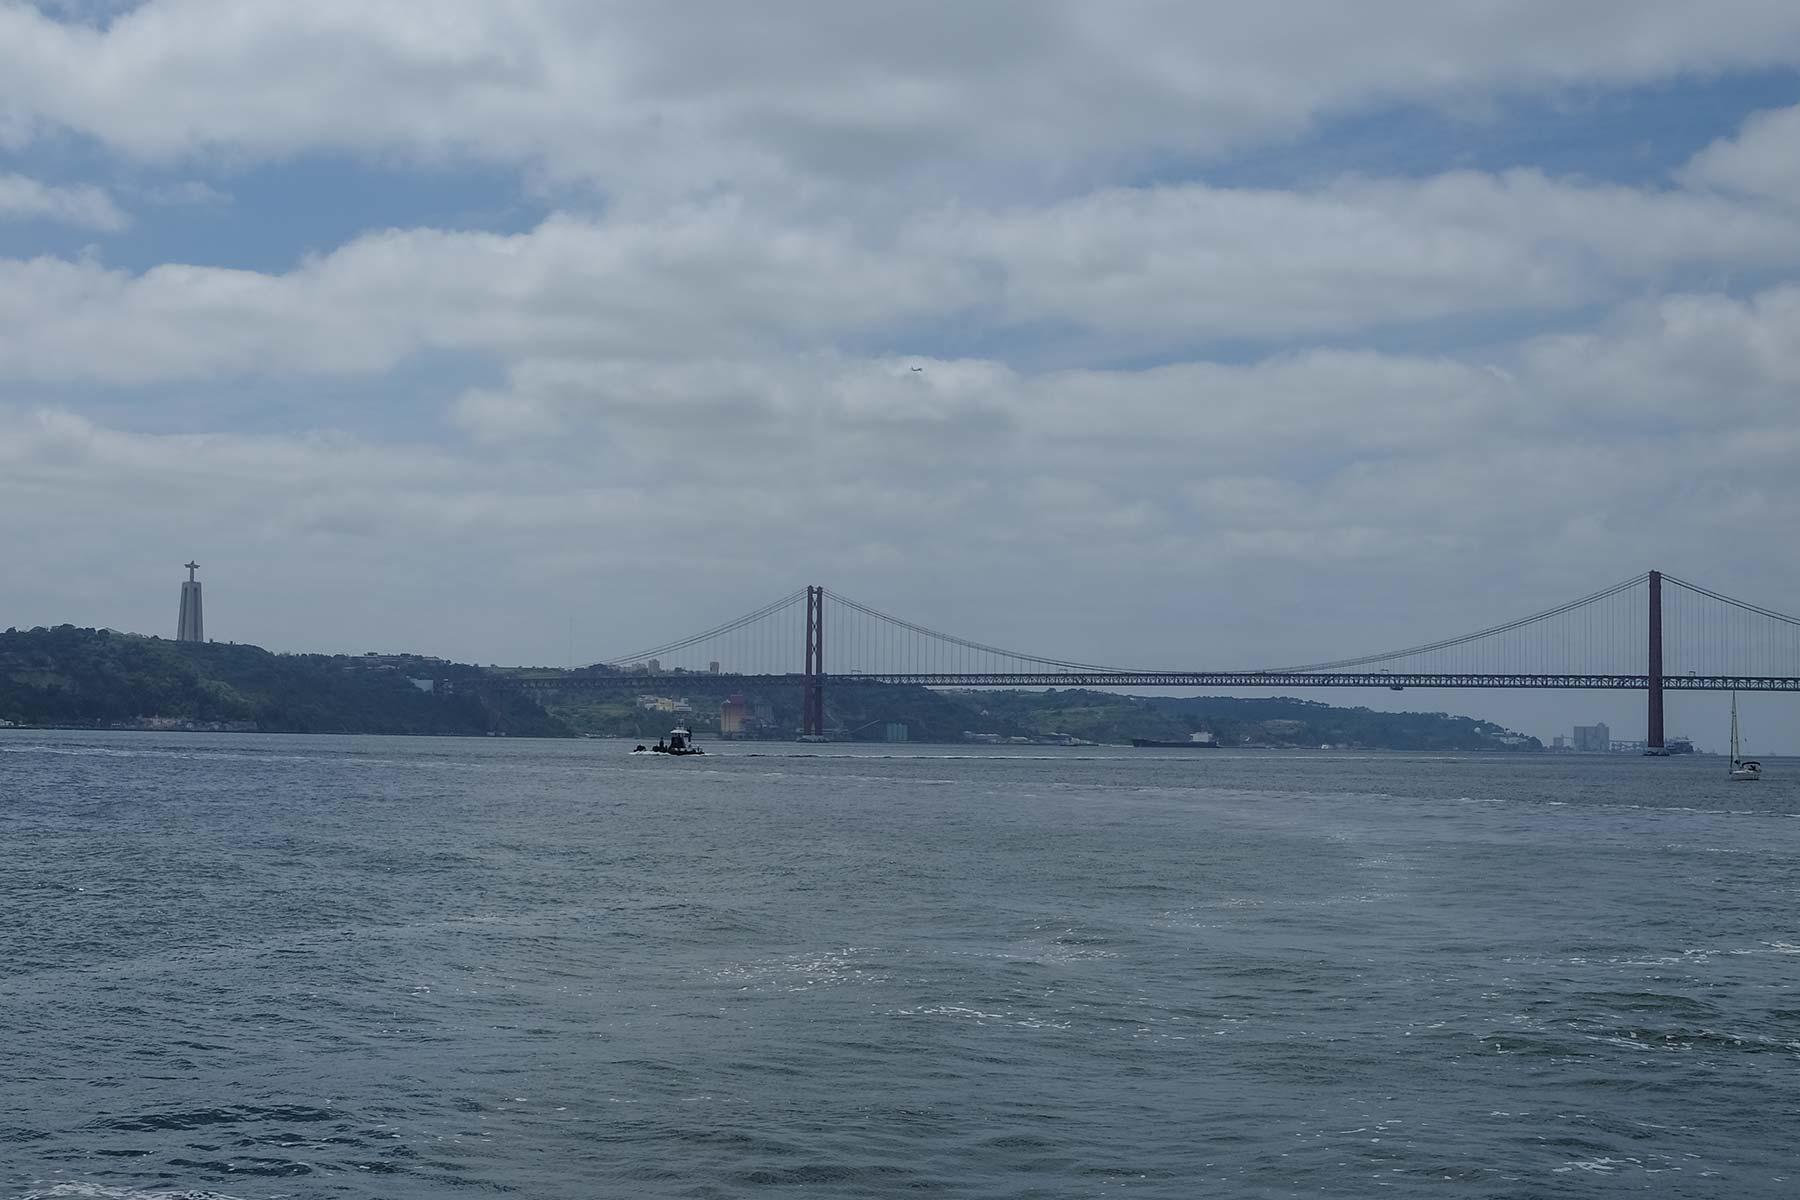 Ponte 25 de Abril in Lissabon, Portugal